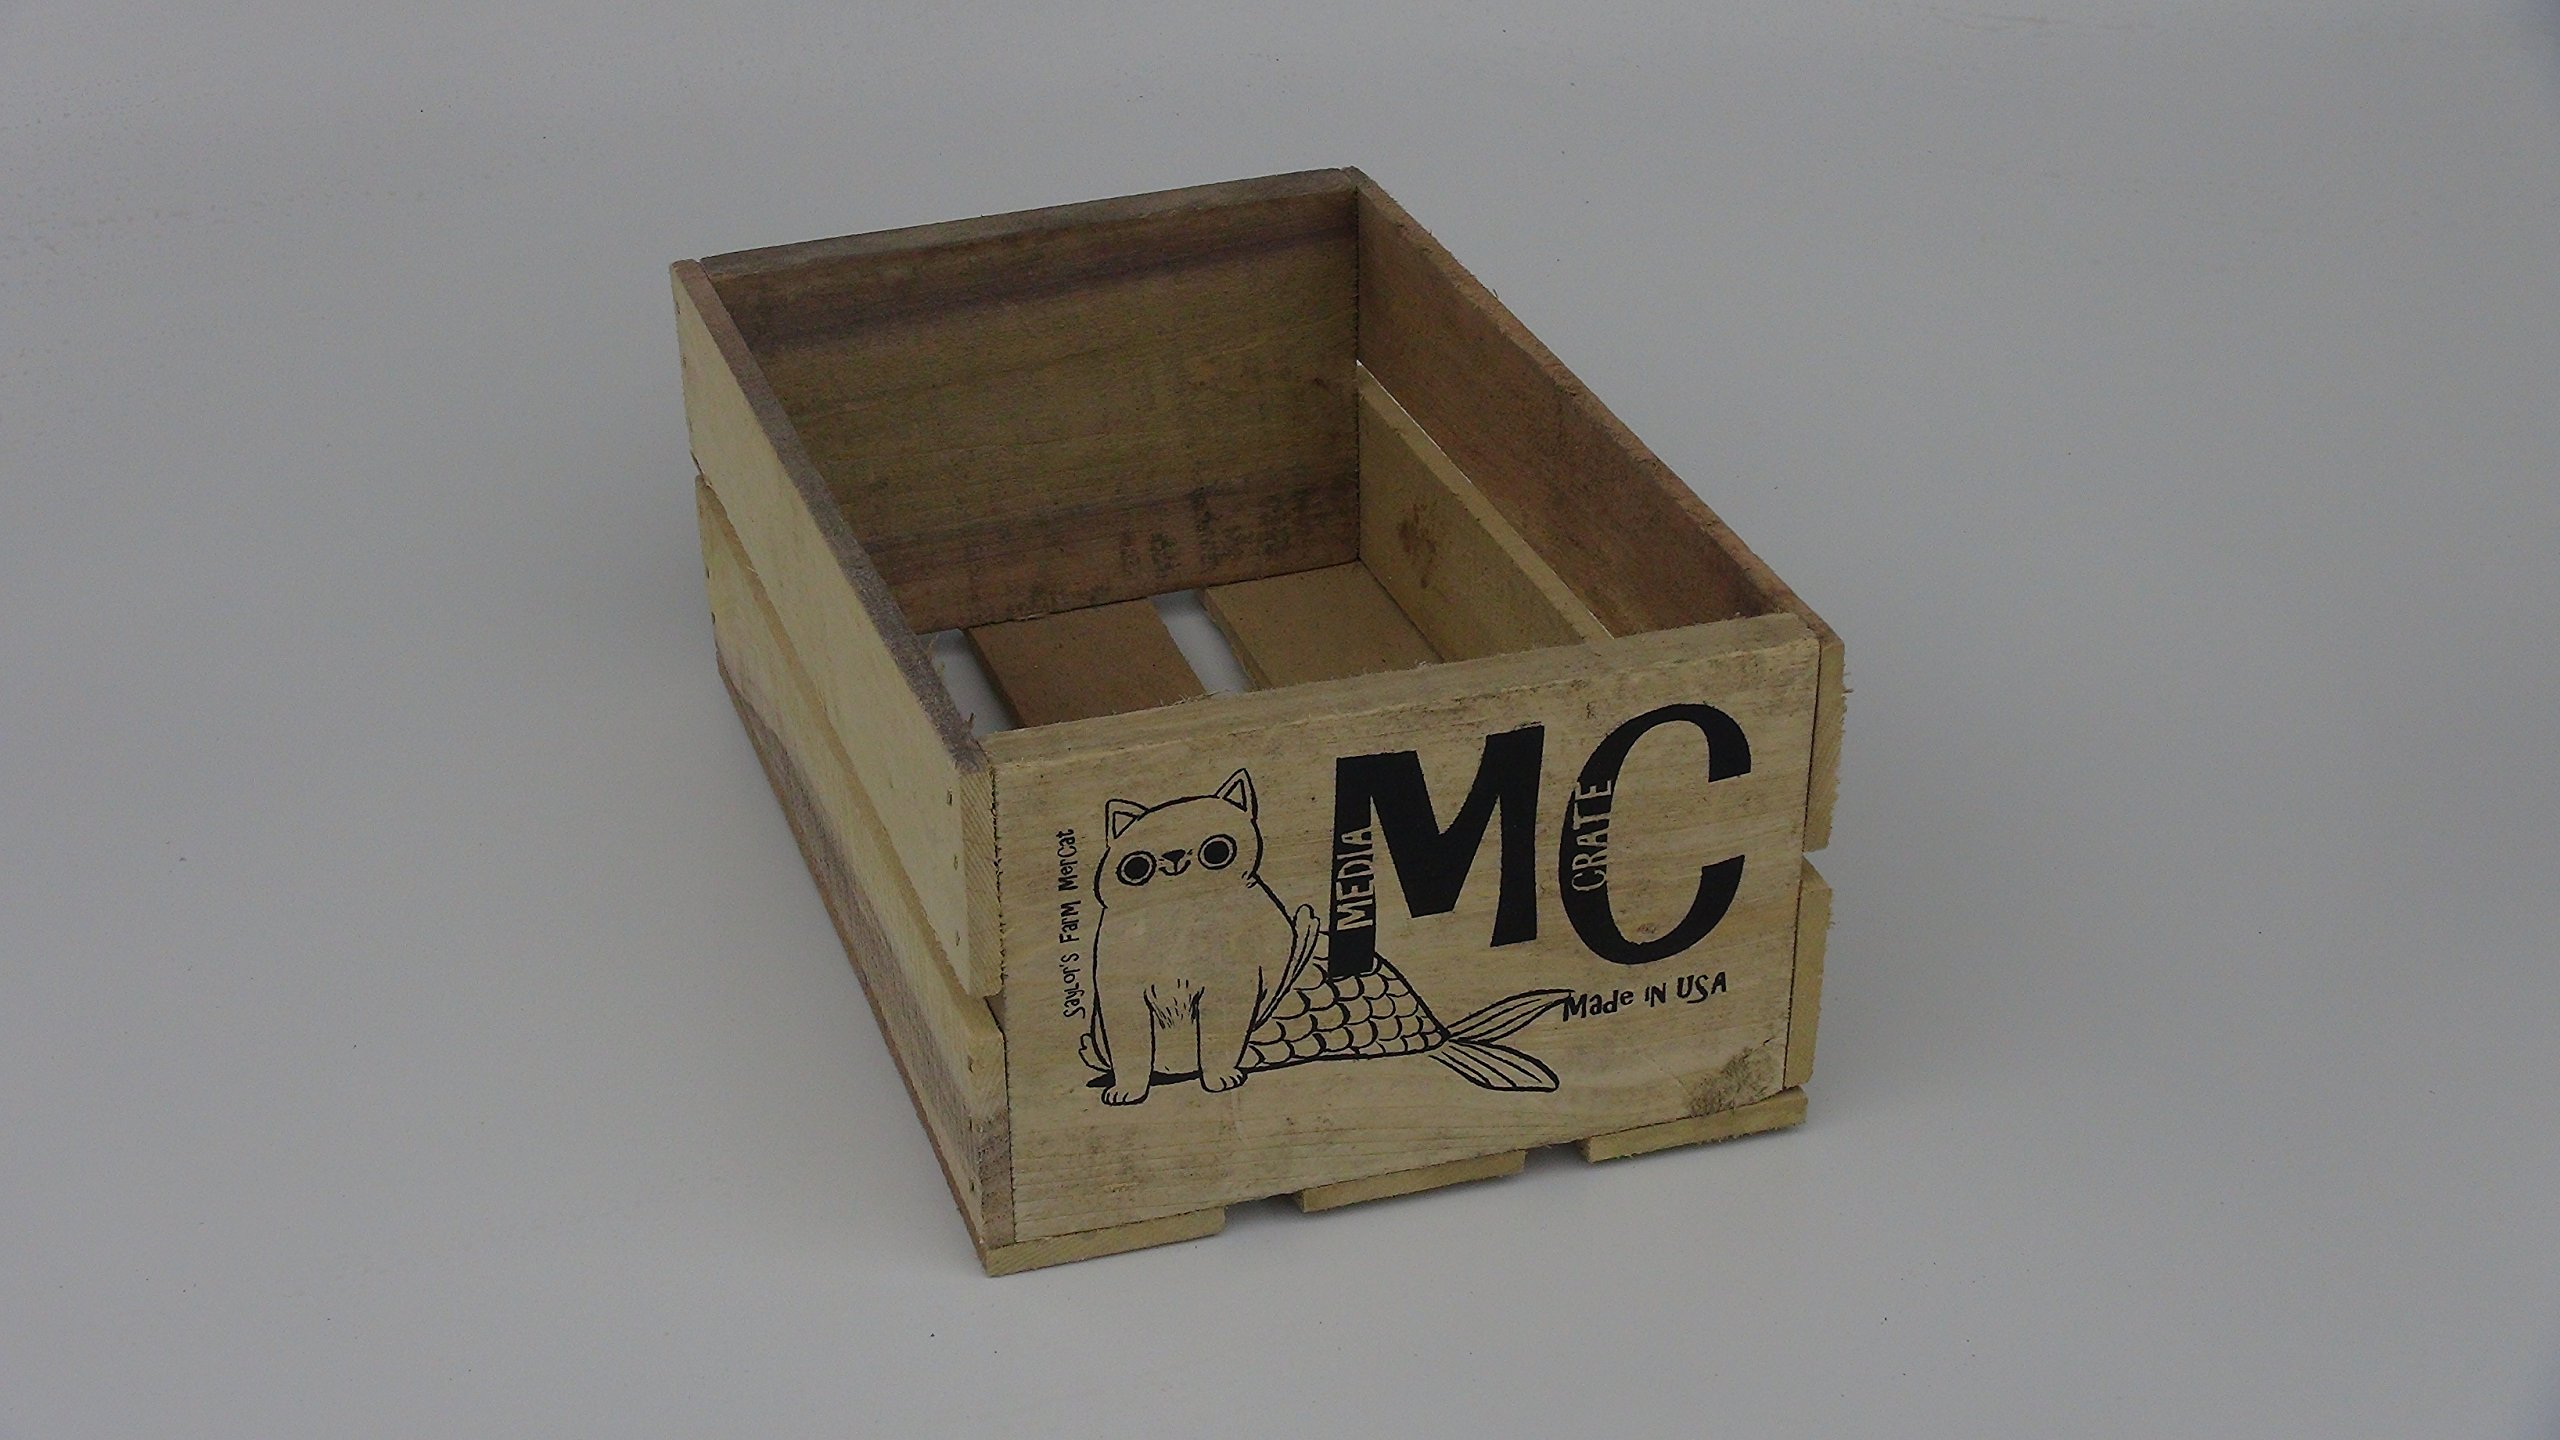 Rustic Wood Mercat DVD Media Crate - Video Games, CD, Storage